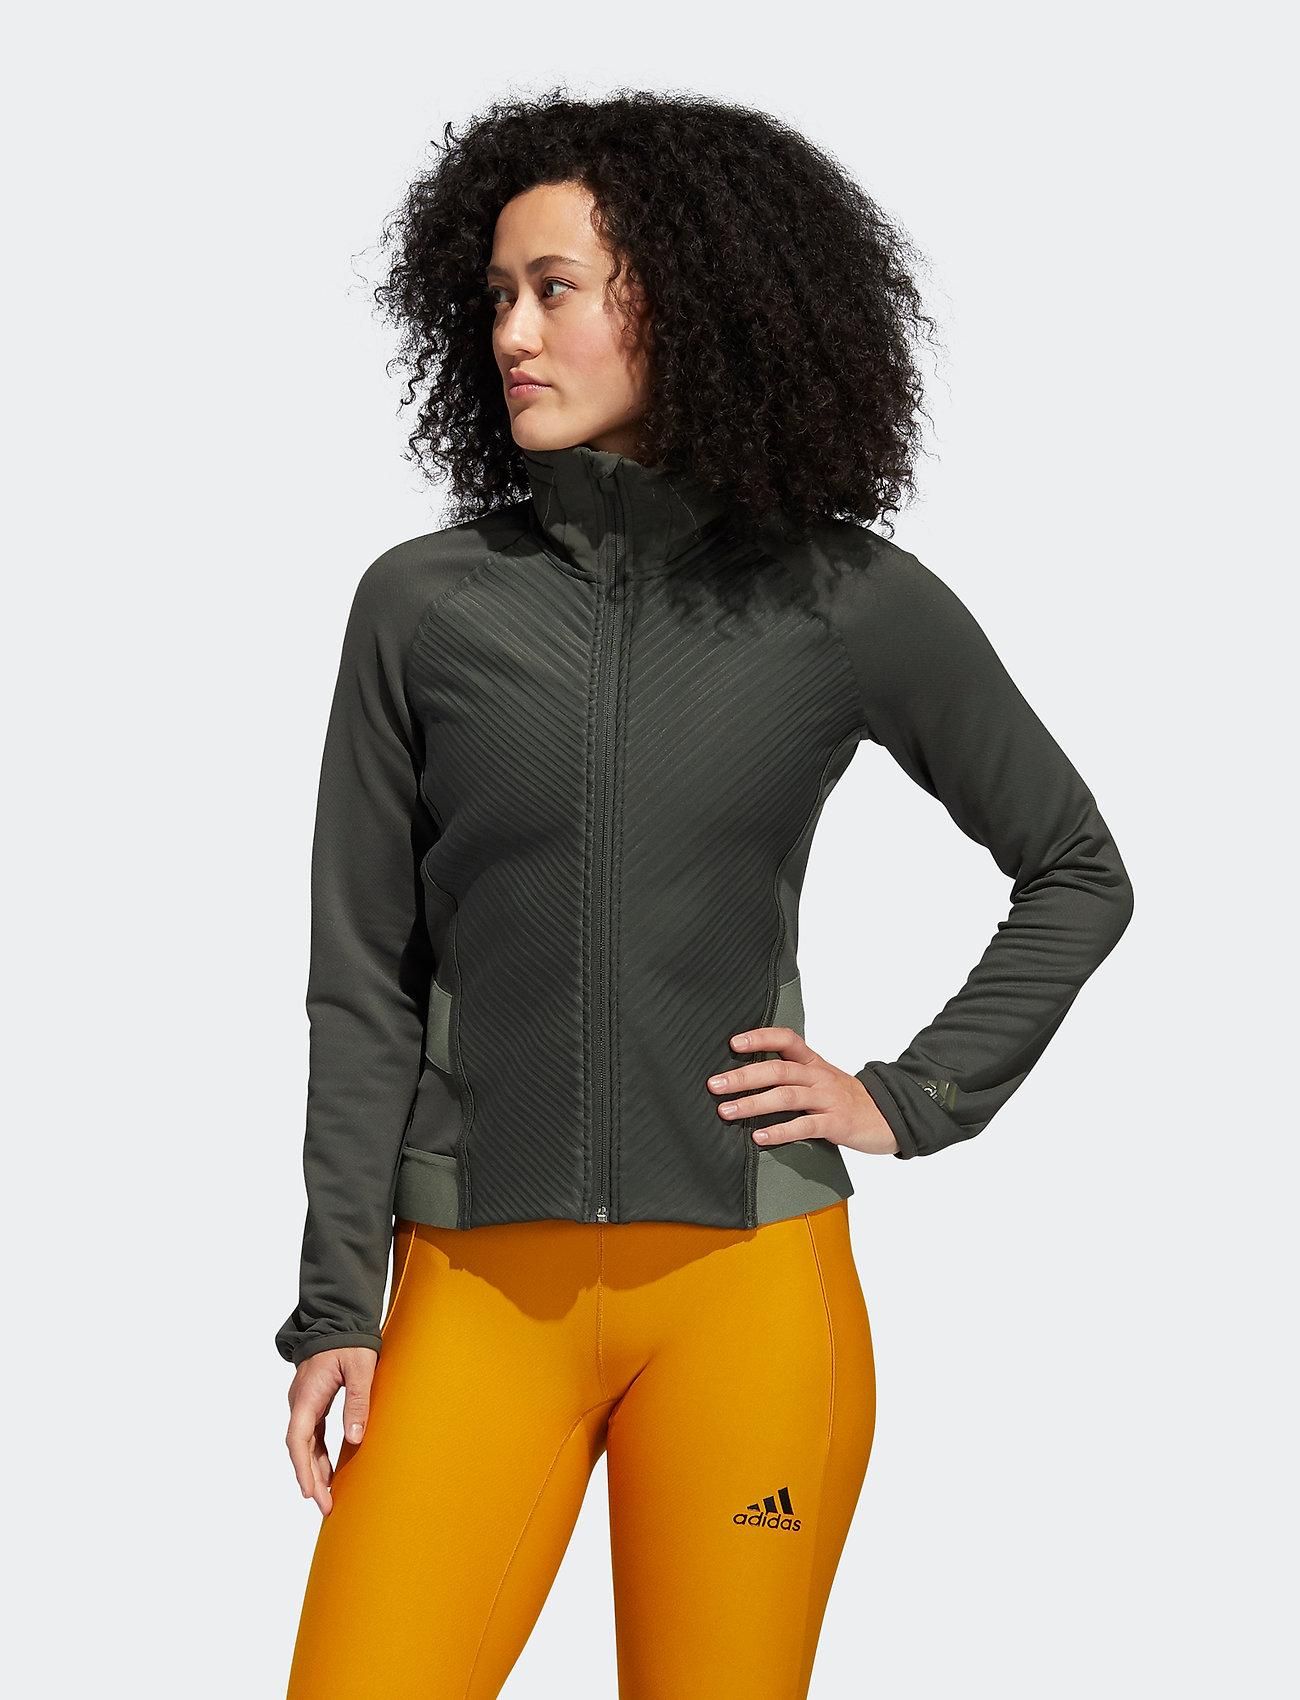 adidas Performance - T JKT C.RDY - training jackets - legear - 0